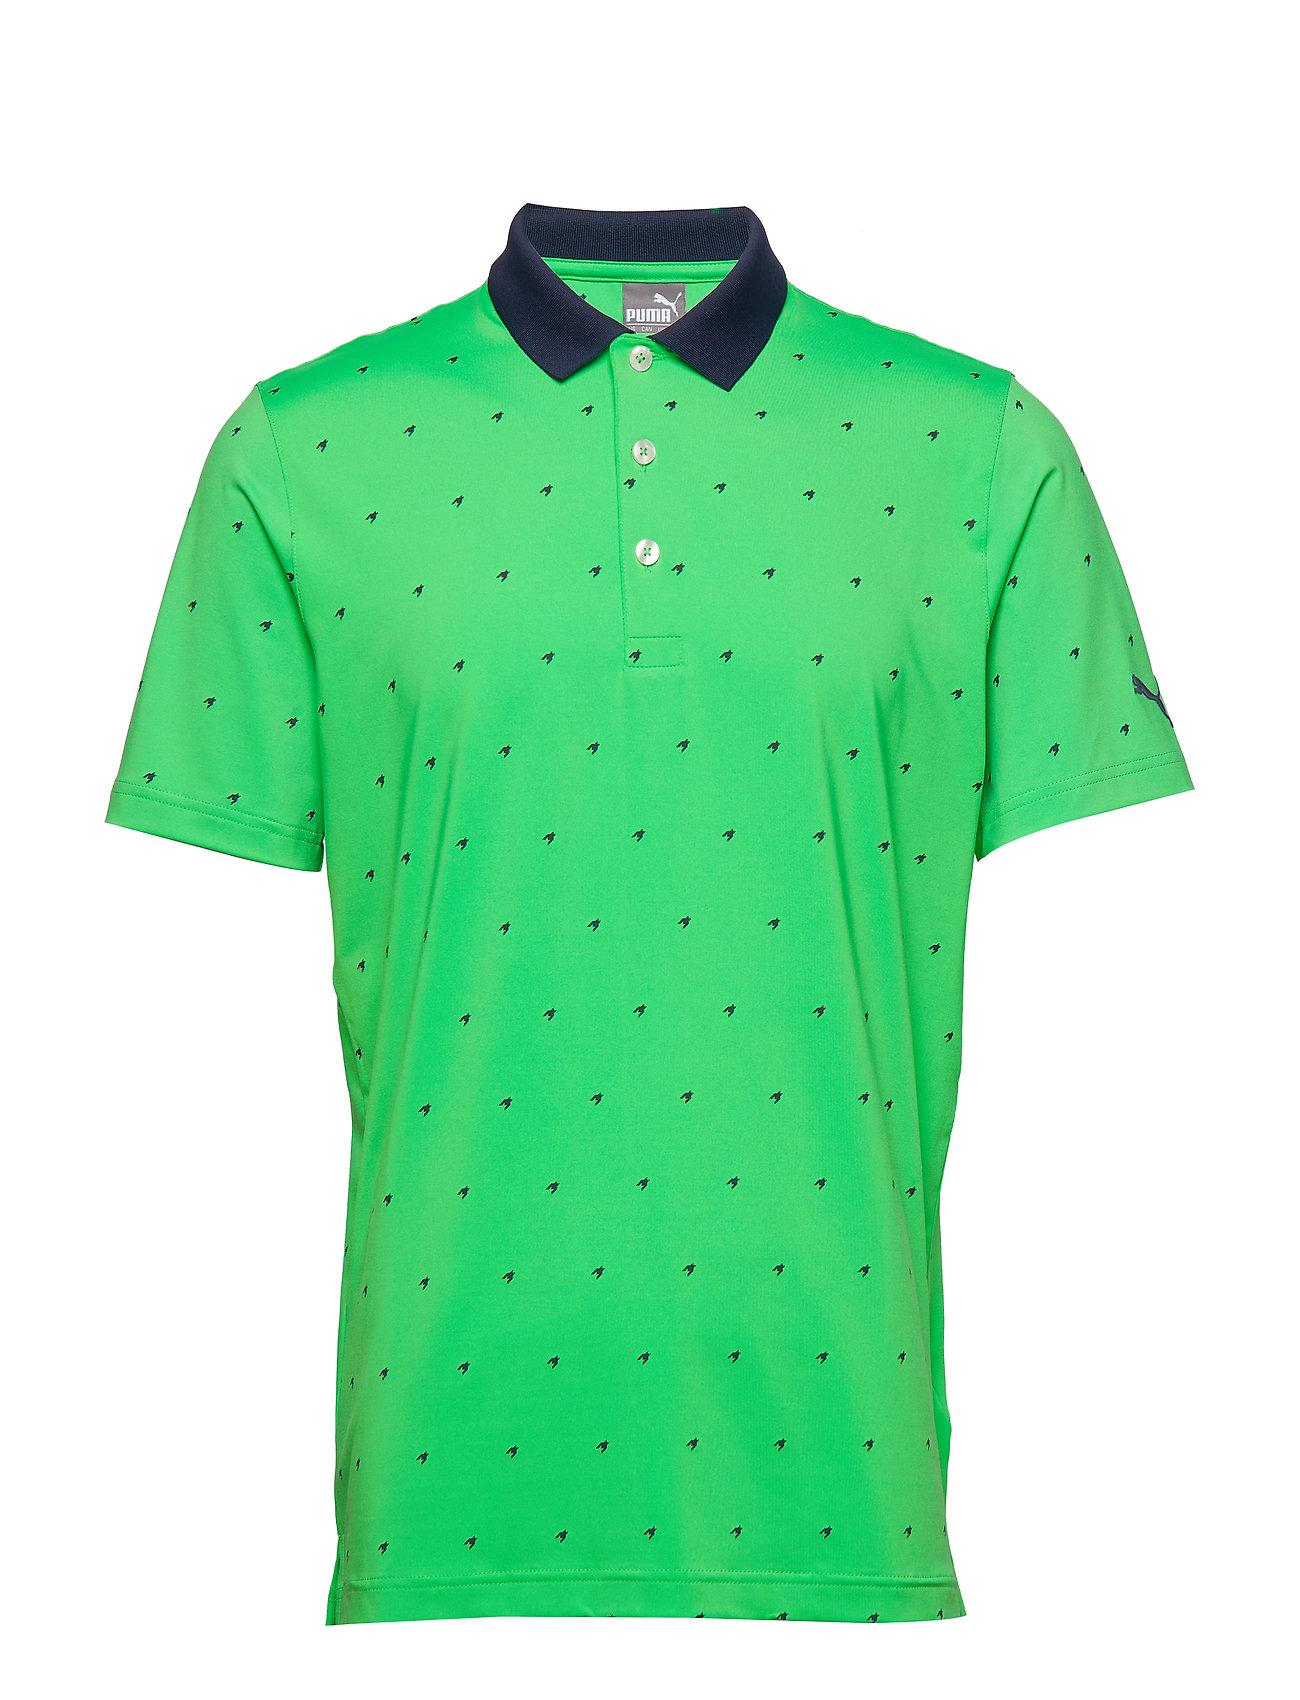 PUMA Golf Skerries Polo - IRISH GREEN